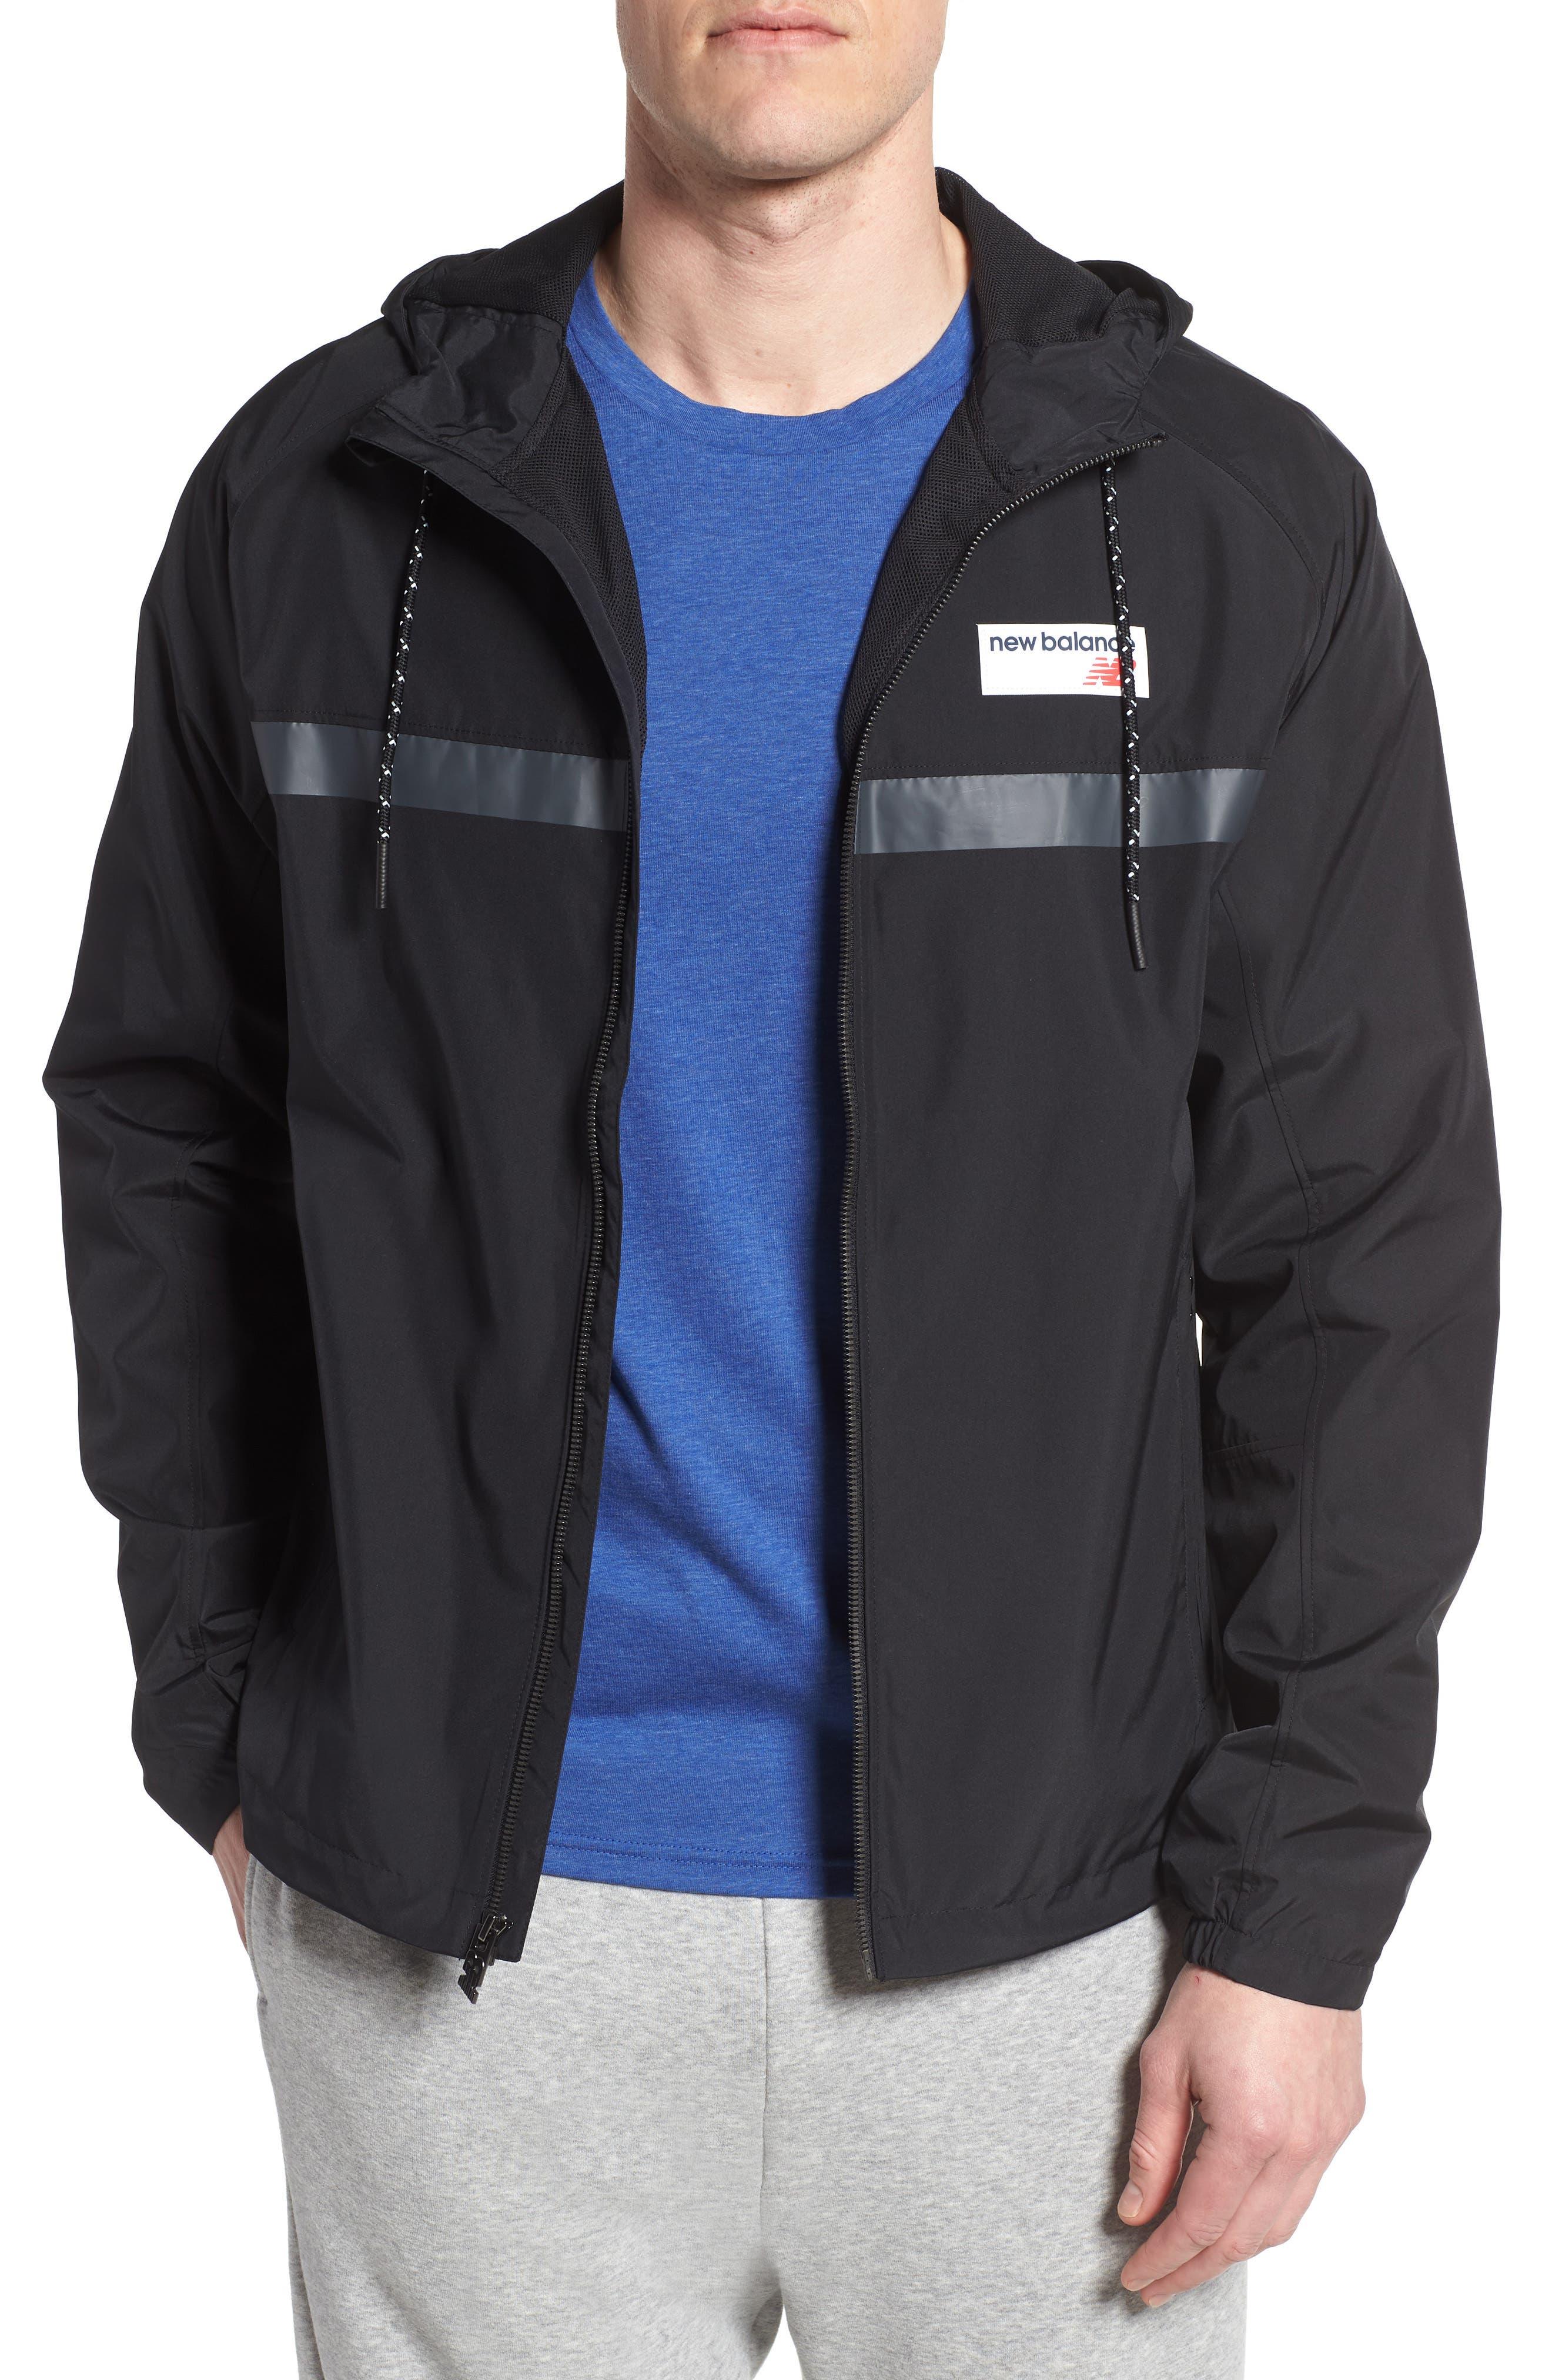 Athletics 78 Jacket,                             Main thumbnail 1, color,                             001